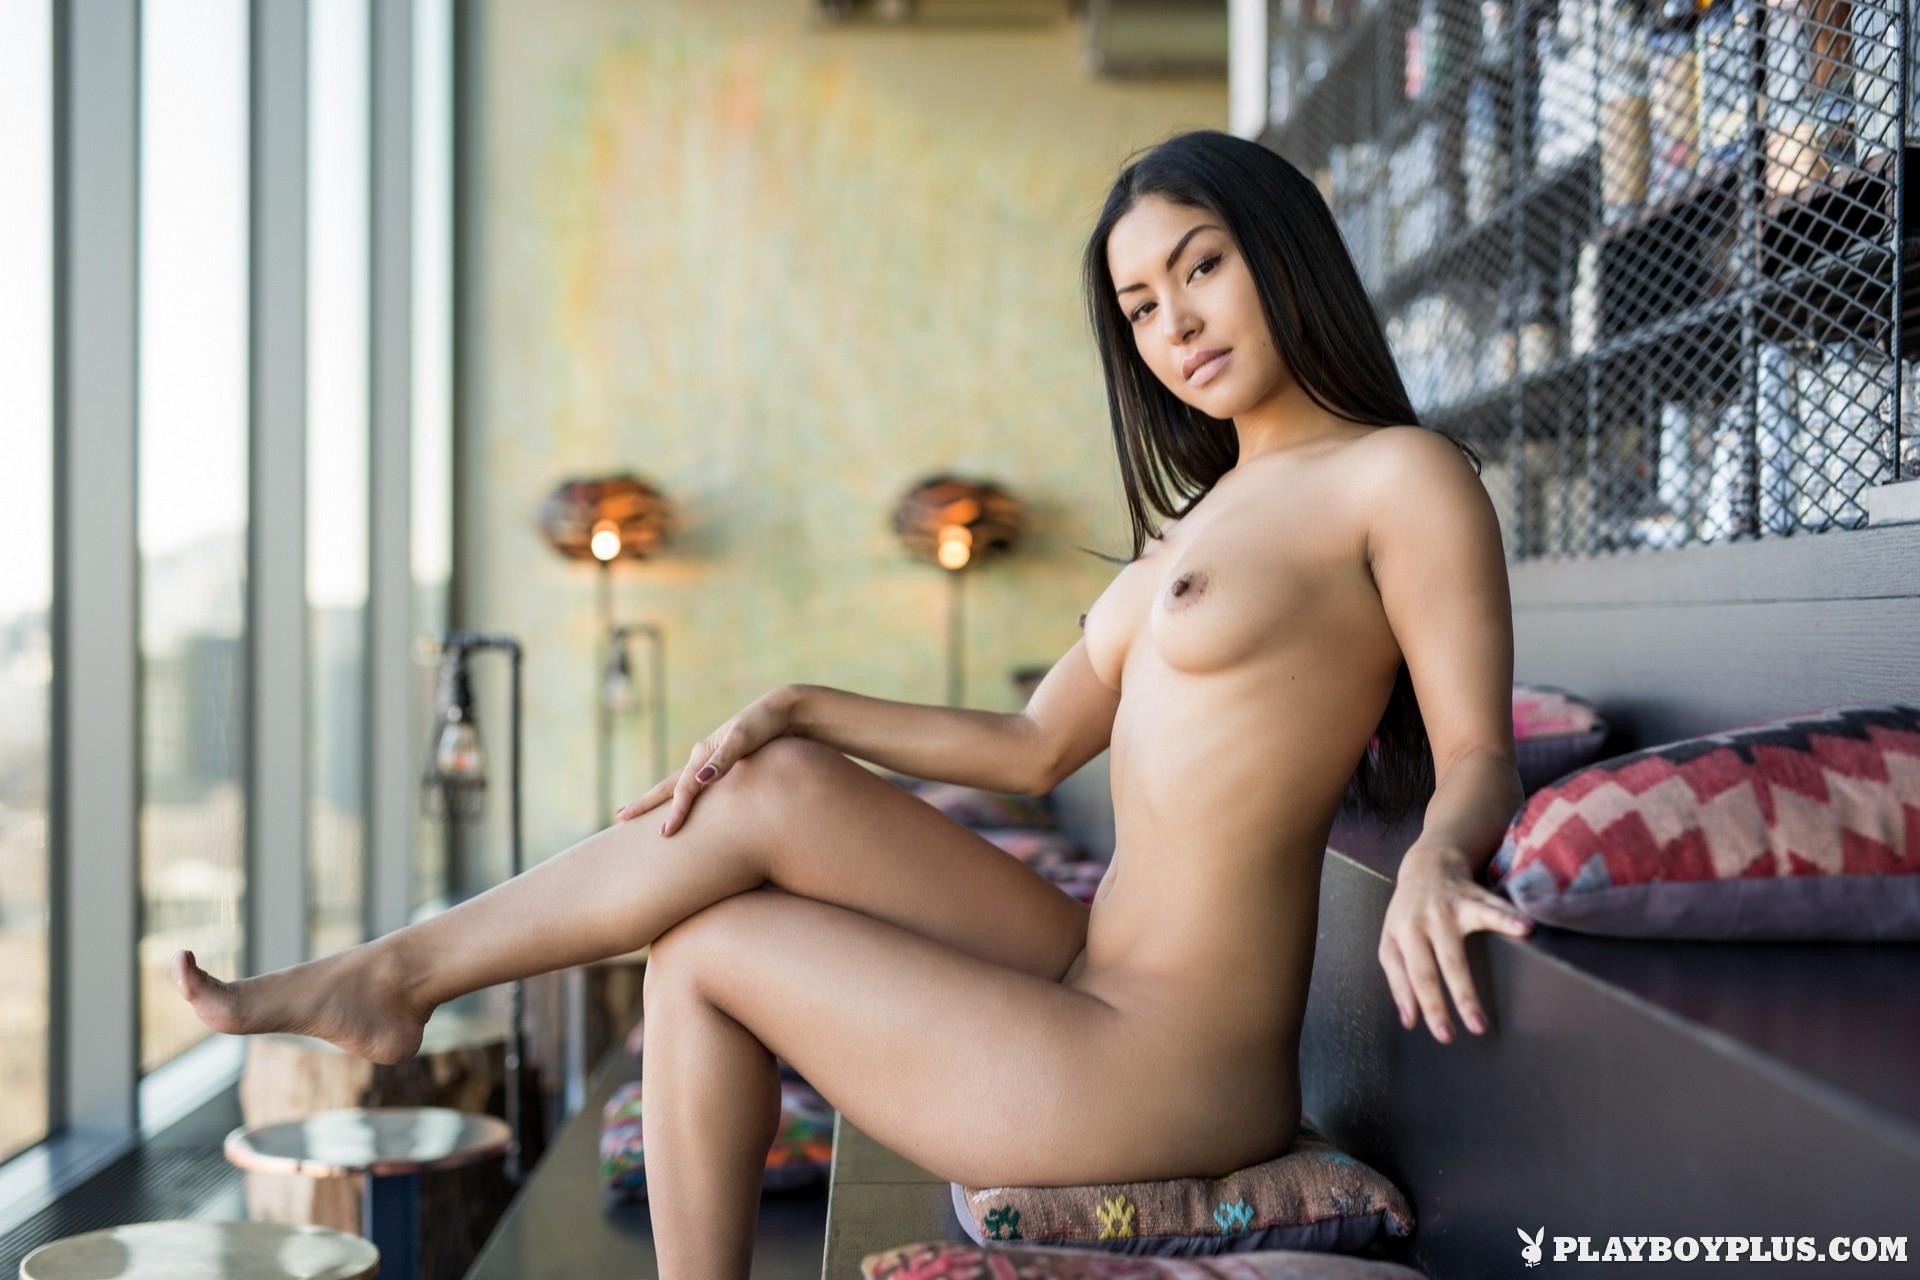 Playboy Plus Chloe Rose In Inspiring View (6)